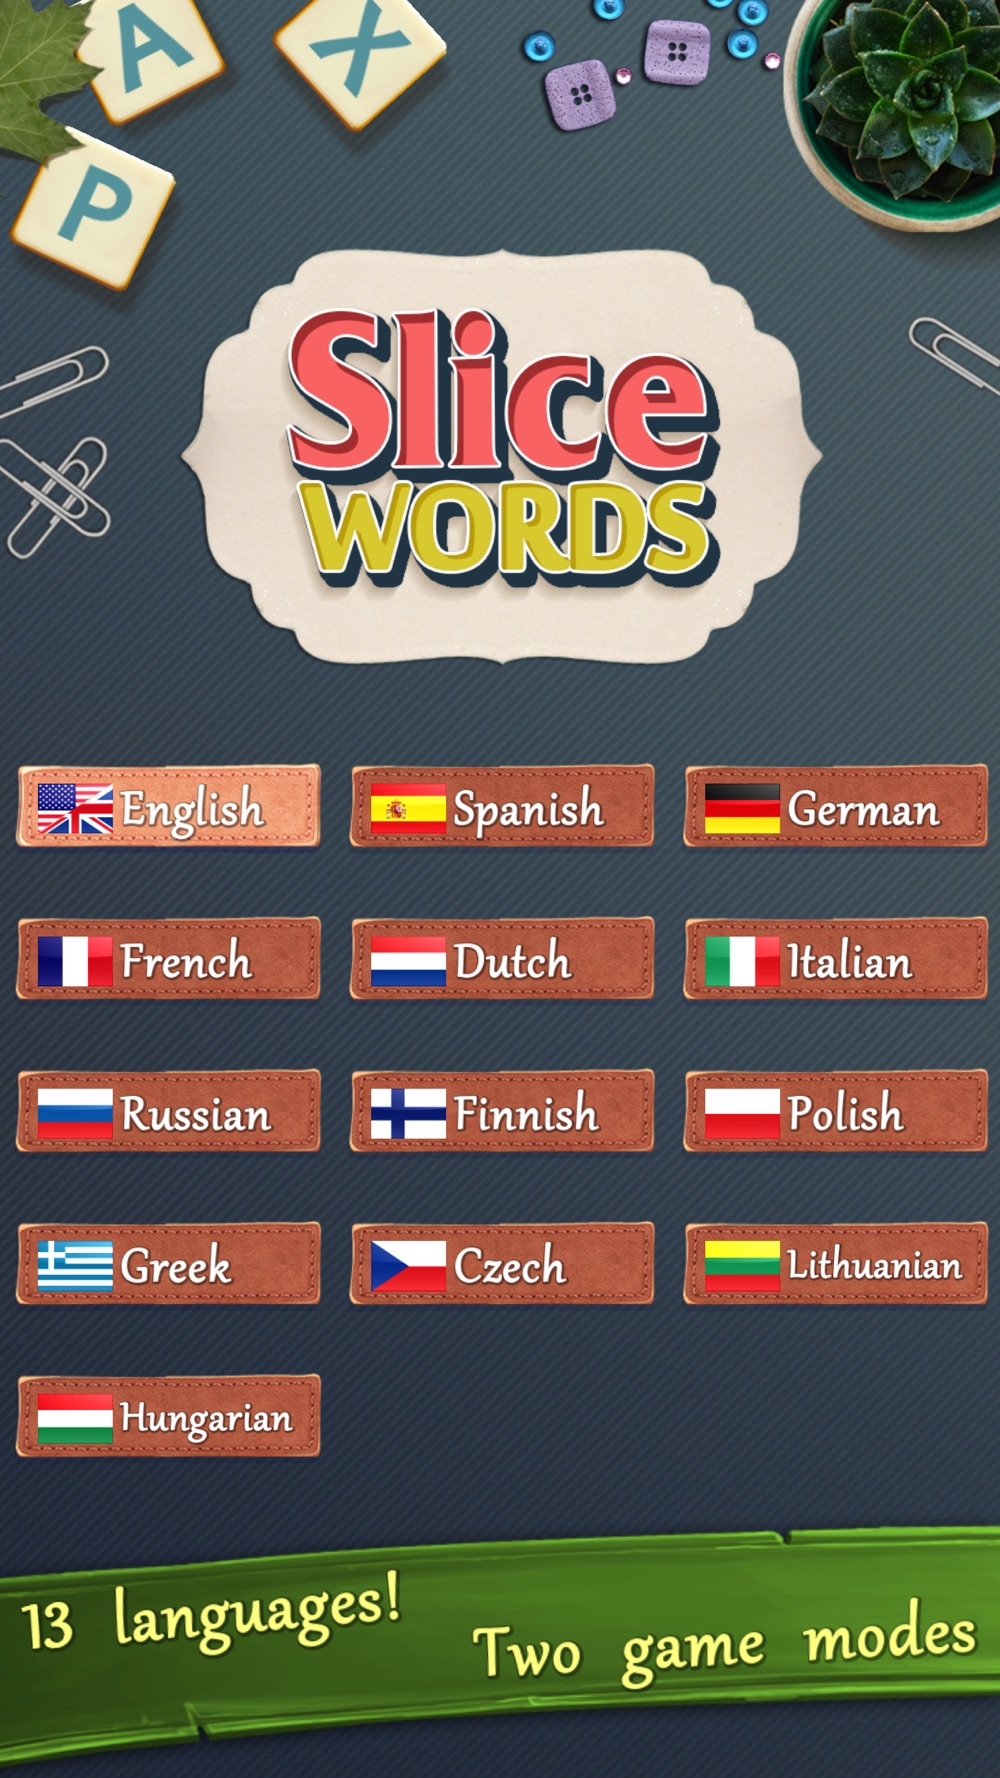 Slice Words Cheat Codes